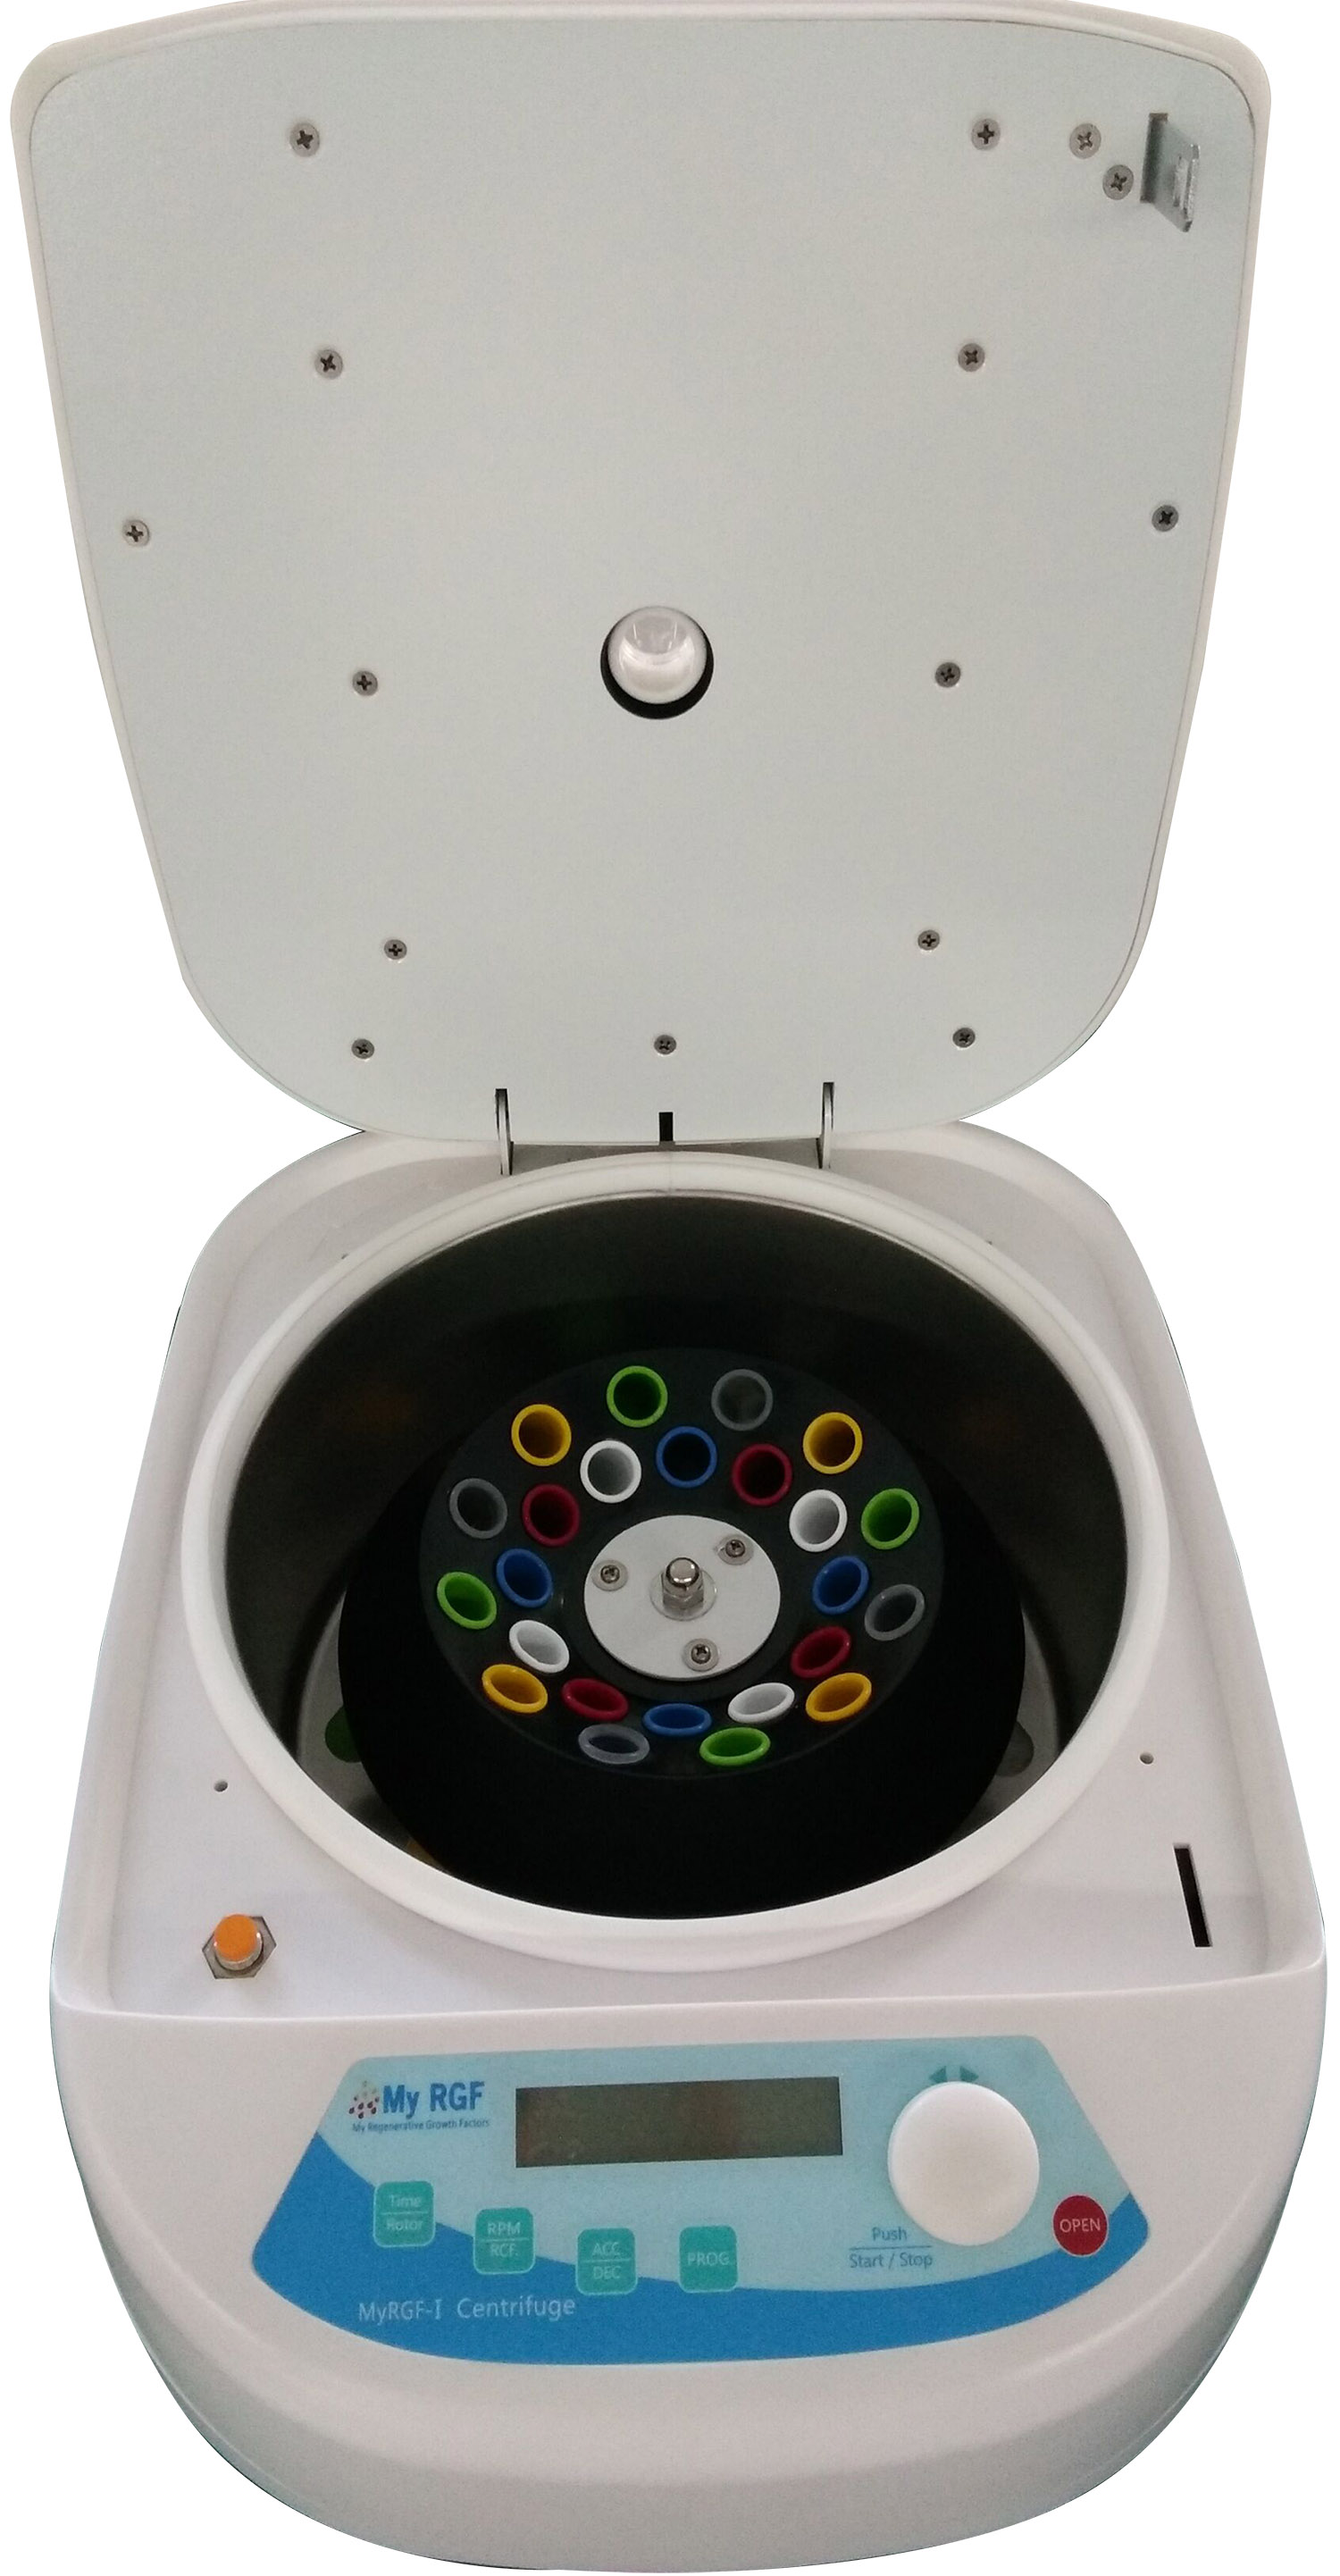 myrgf-centrifuge-open.jpg